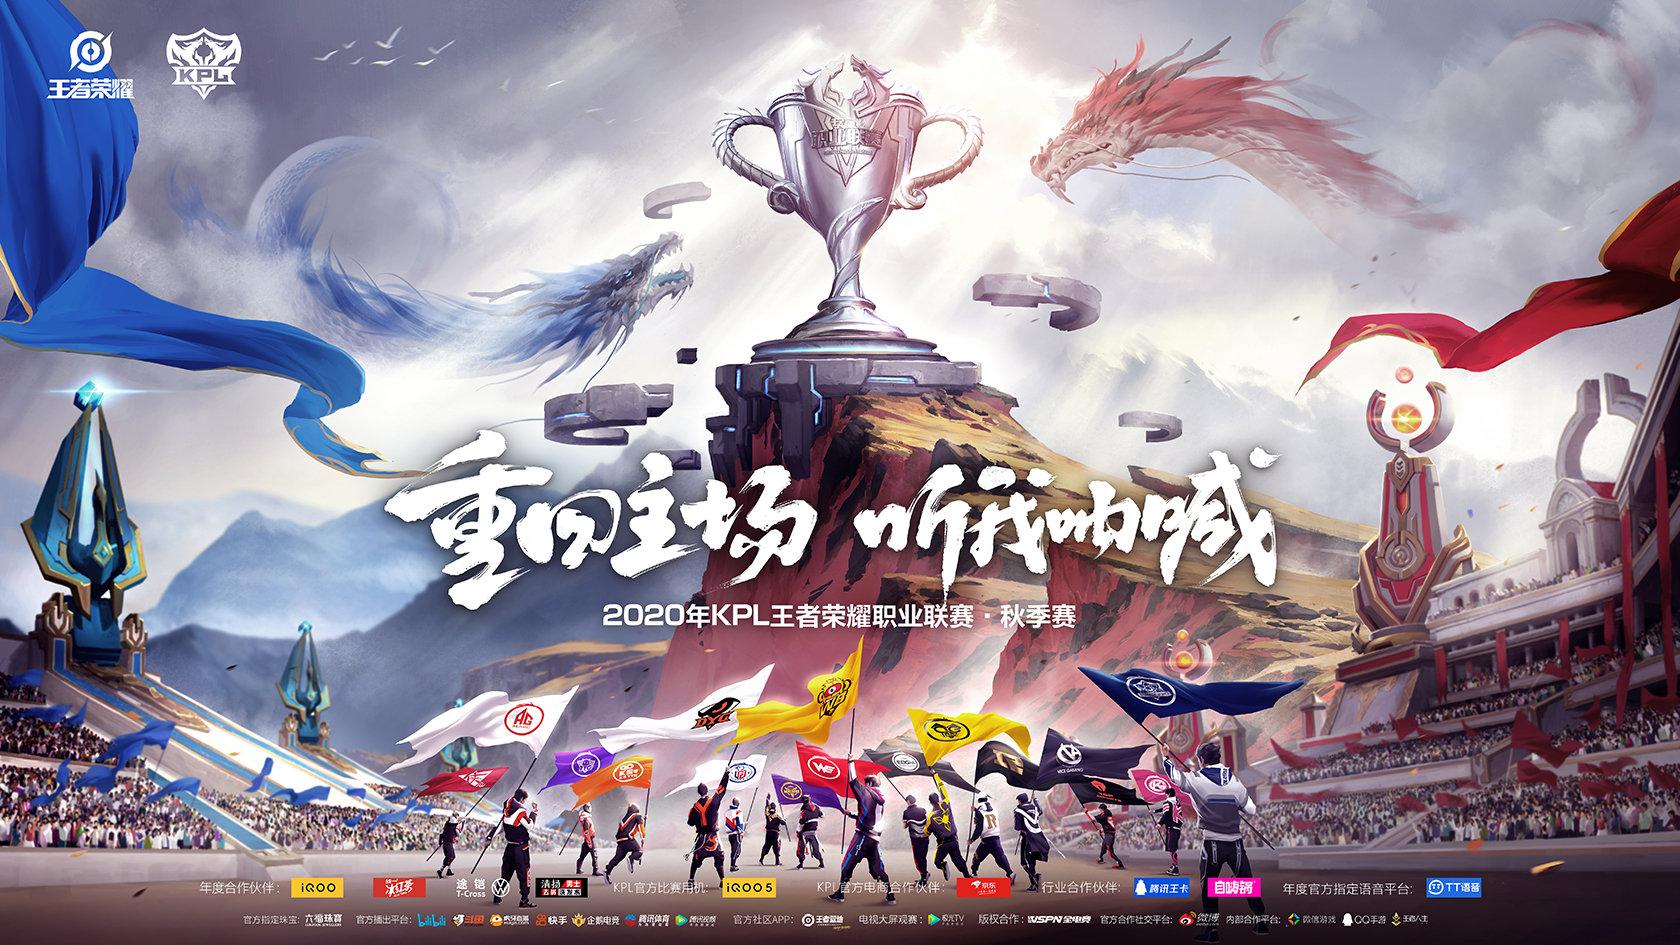 2020kpl秋季赛常规赛9月16日Hero久竞vsTTG第五场比赛视频回放?